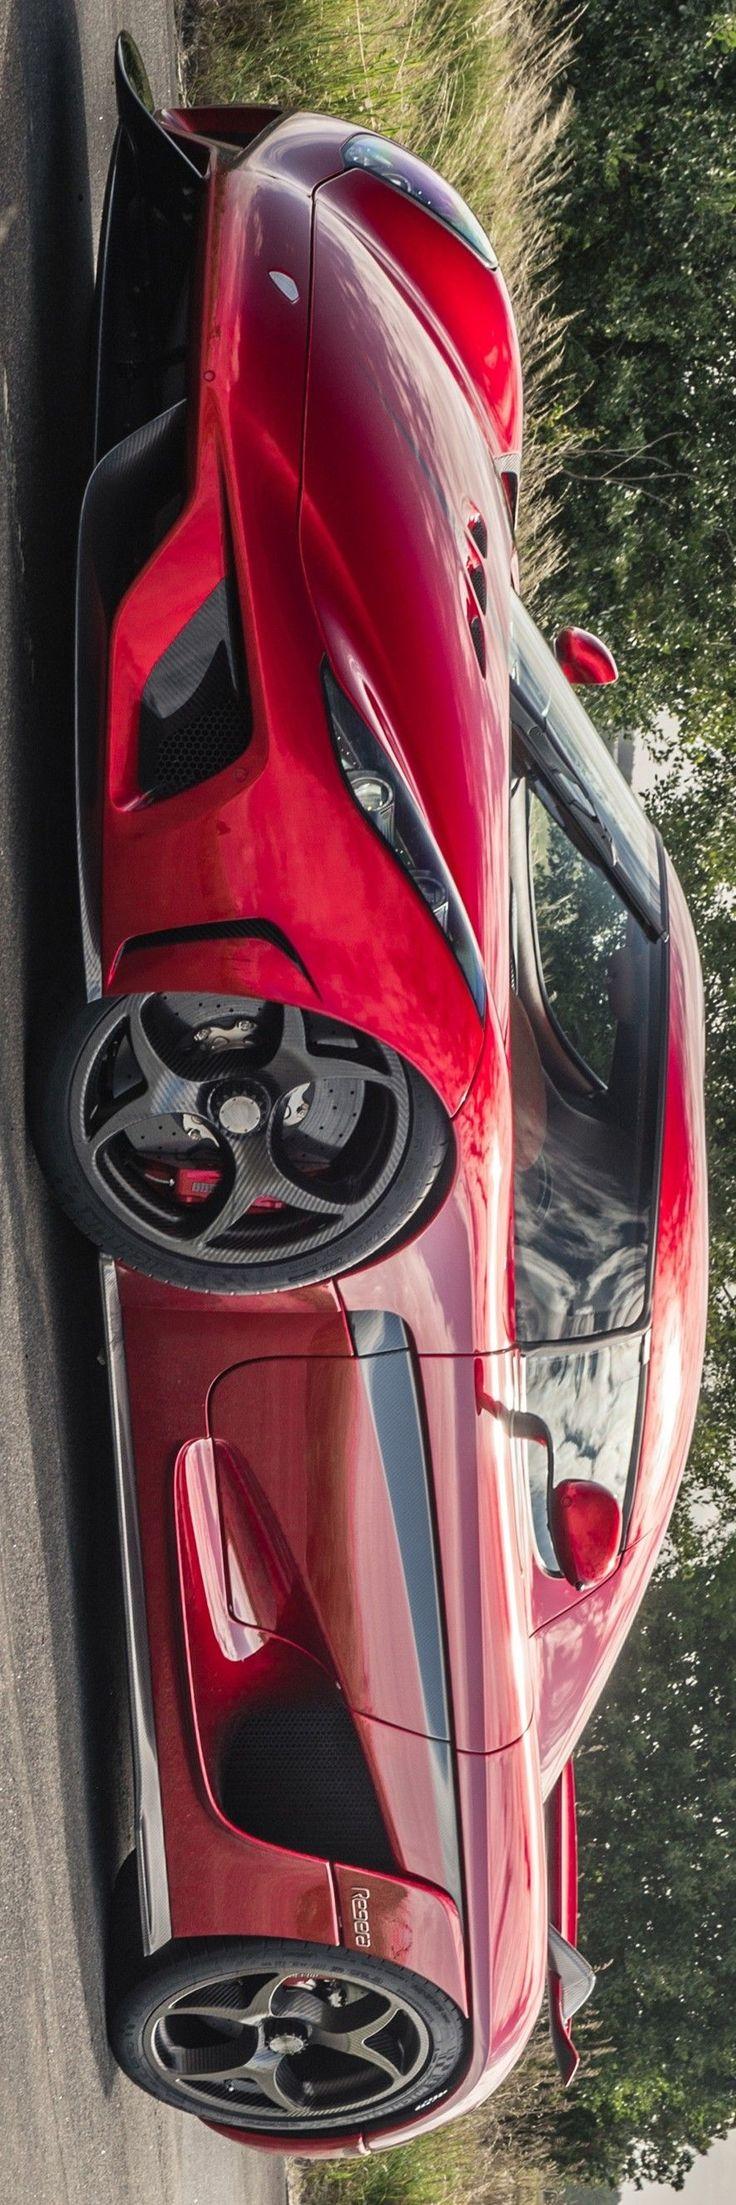 Koenigsegg Regera by Levo #koenigsegg Regera by Levon